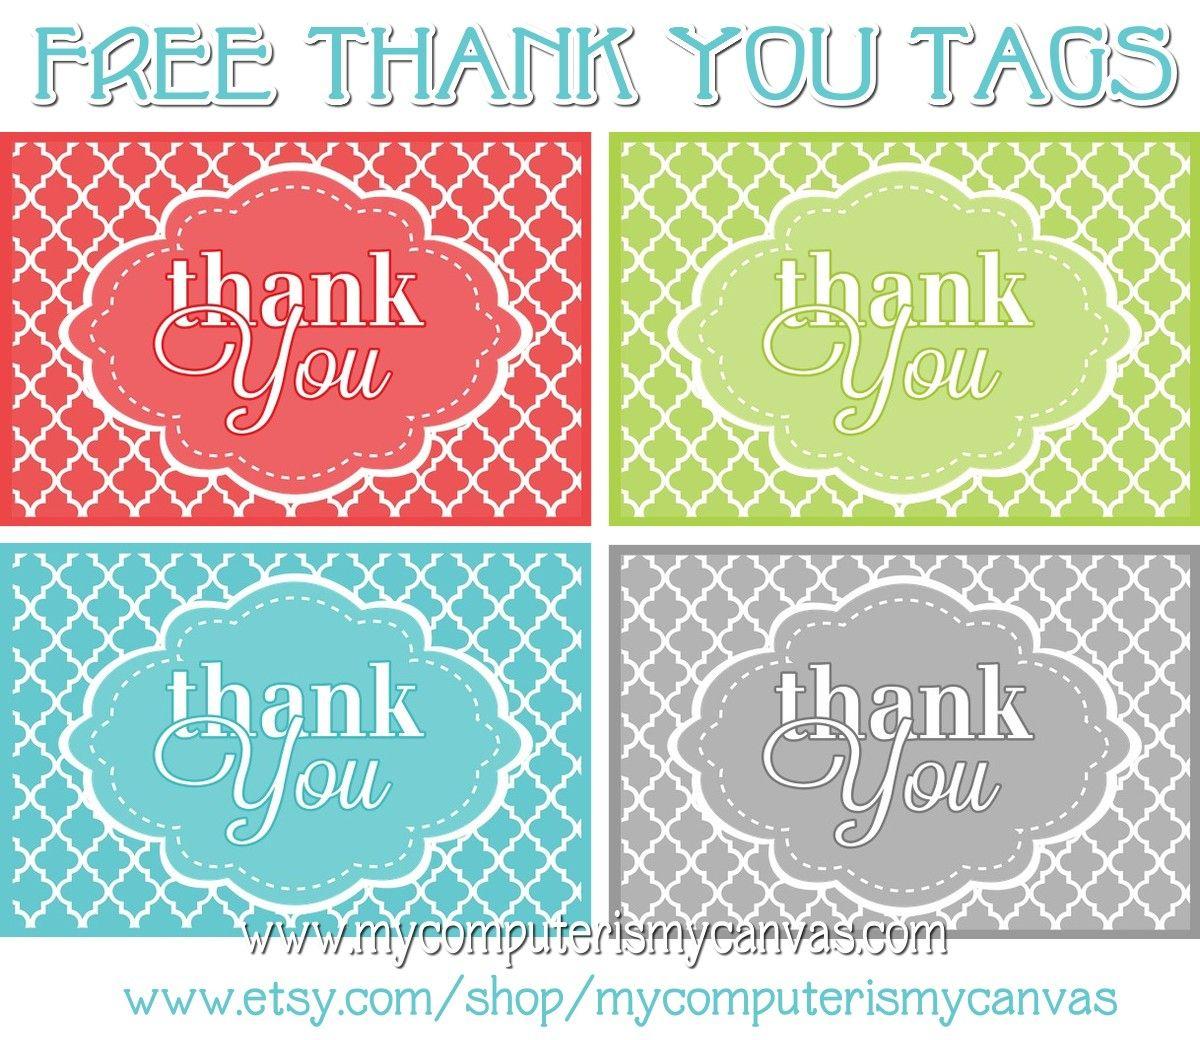 Freebie} Printable Thank You Tags | Printables | Pinterest | Thank - Free Printable Thank You Tags For Birthdays